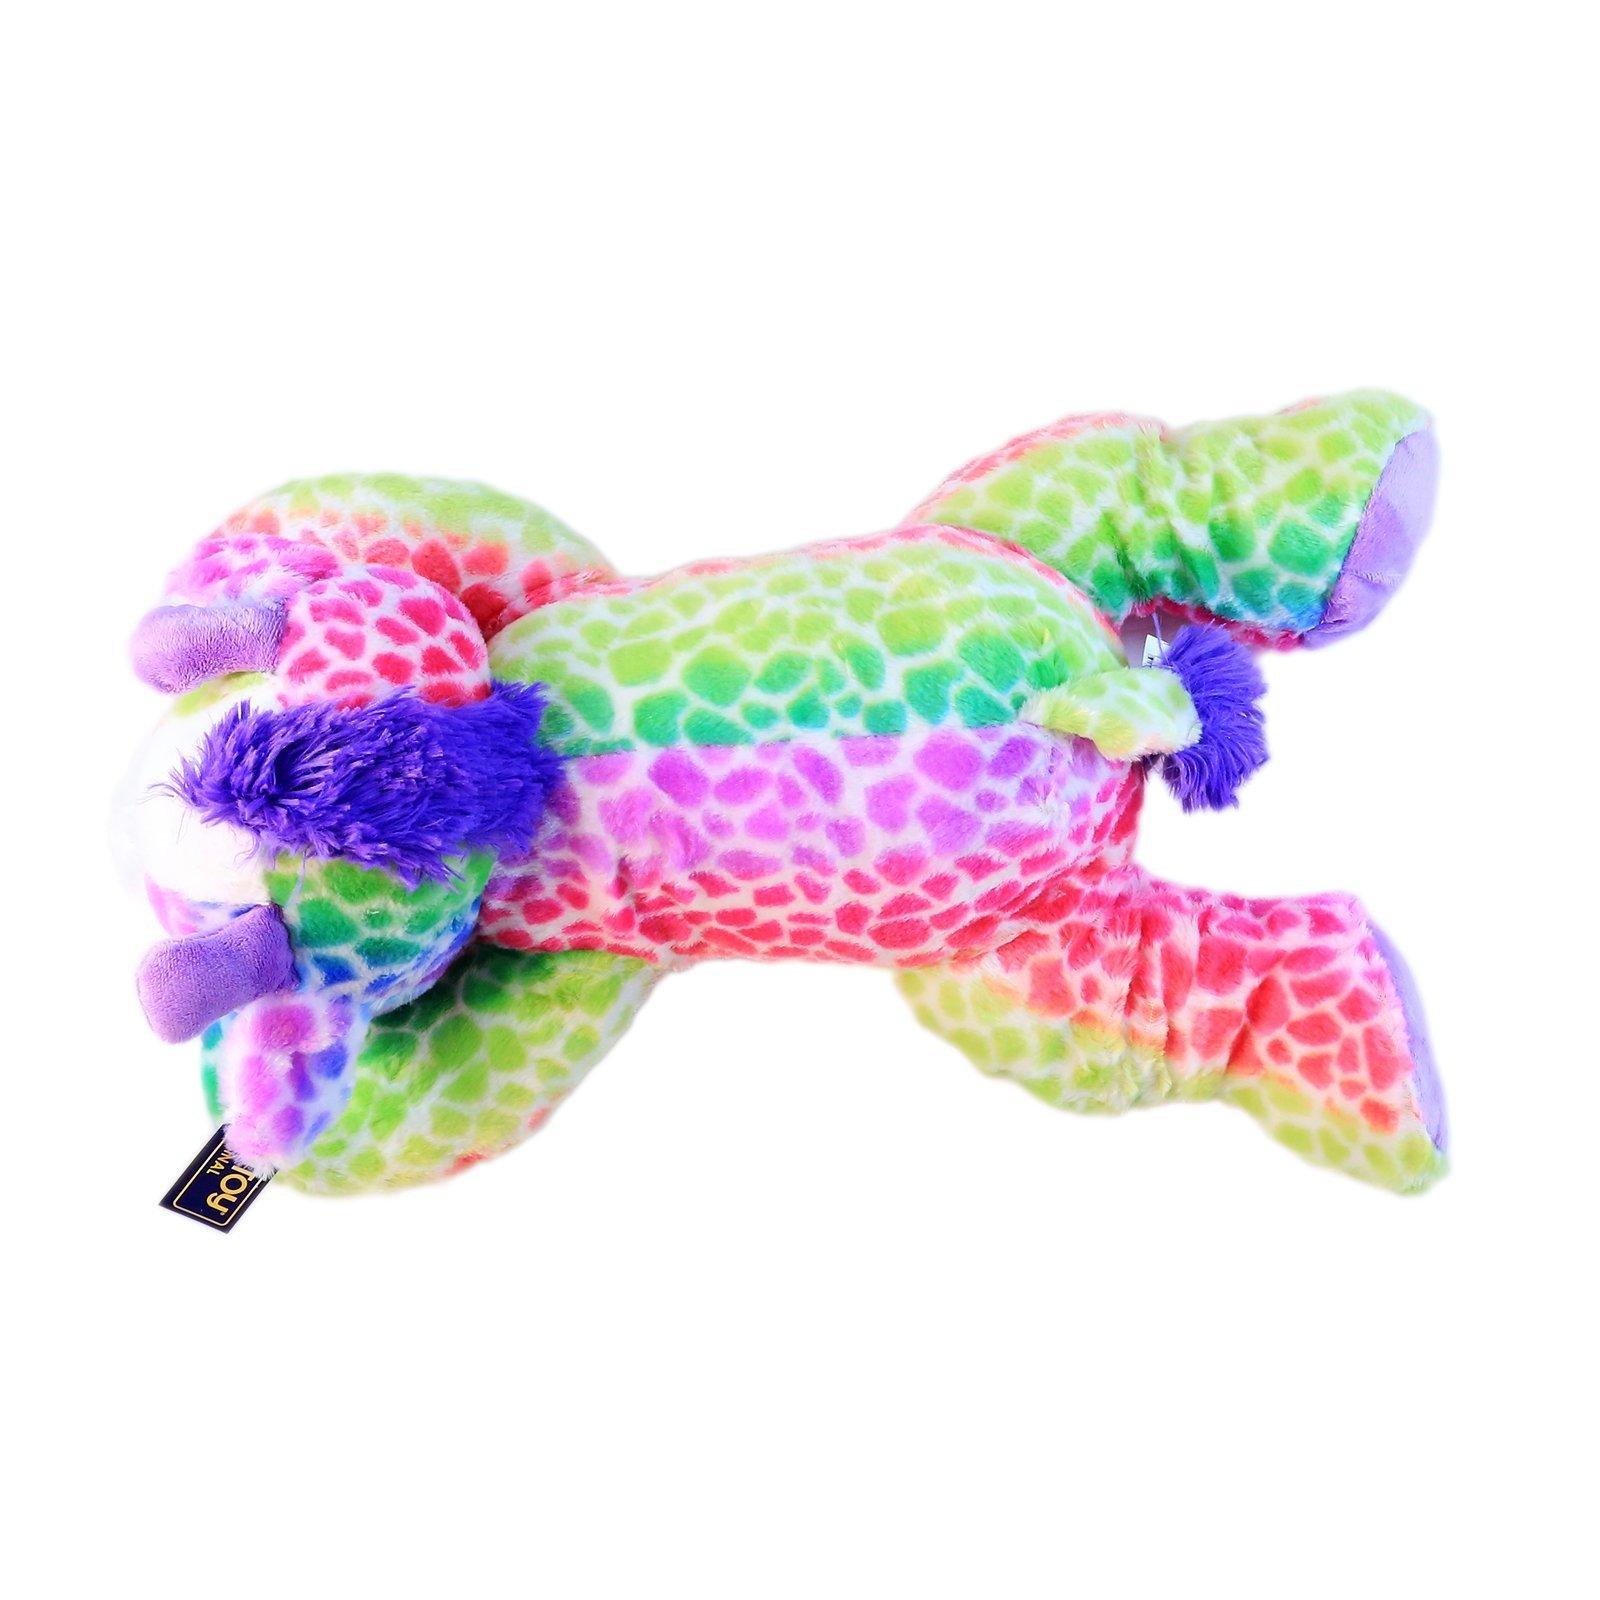 KidPlay Kuddle Toys Huggable Plush Cow Stuffed Animal Gift 23.5 Inches Long